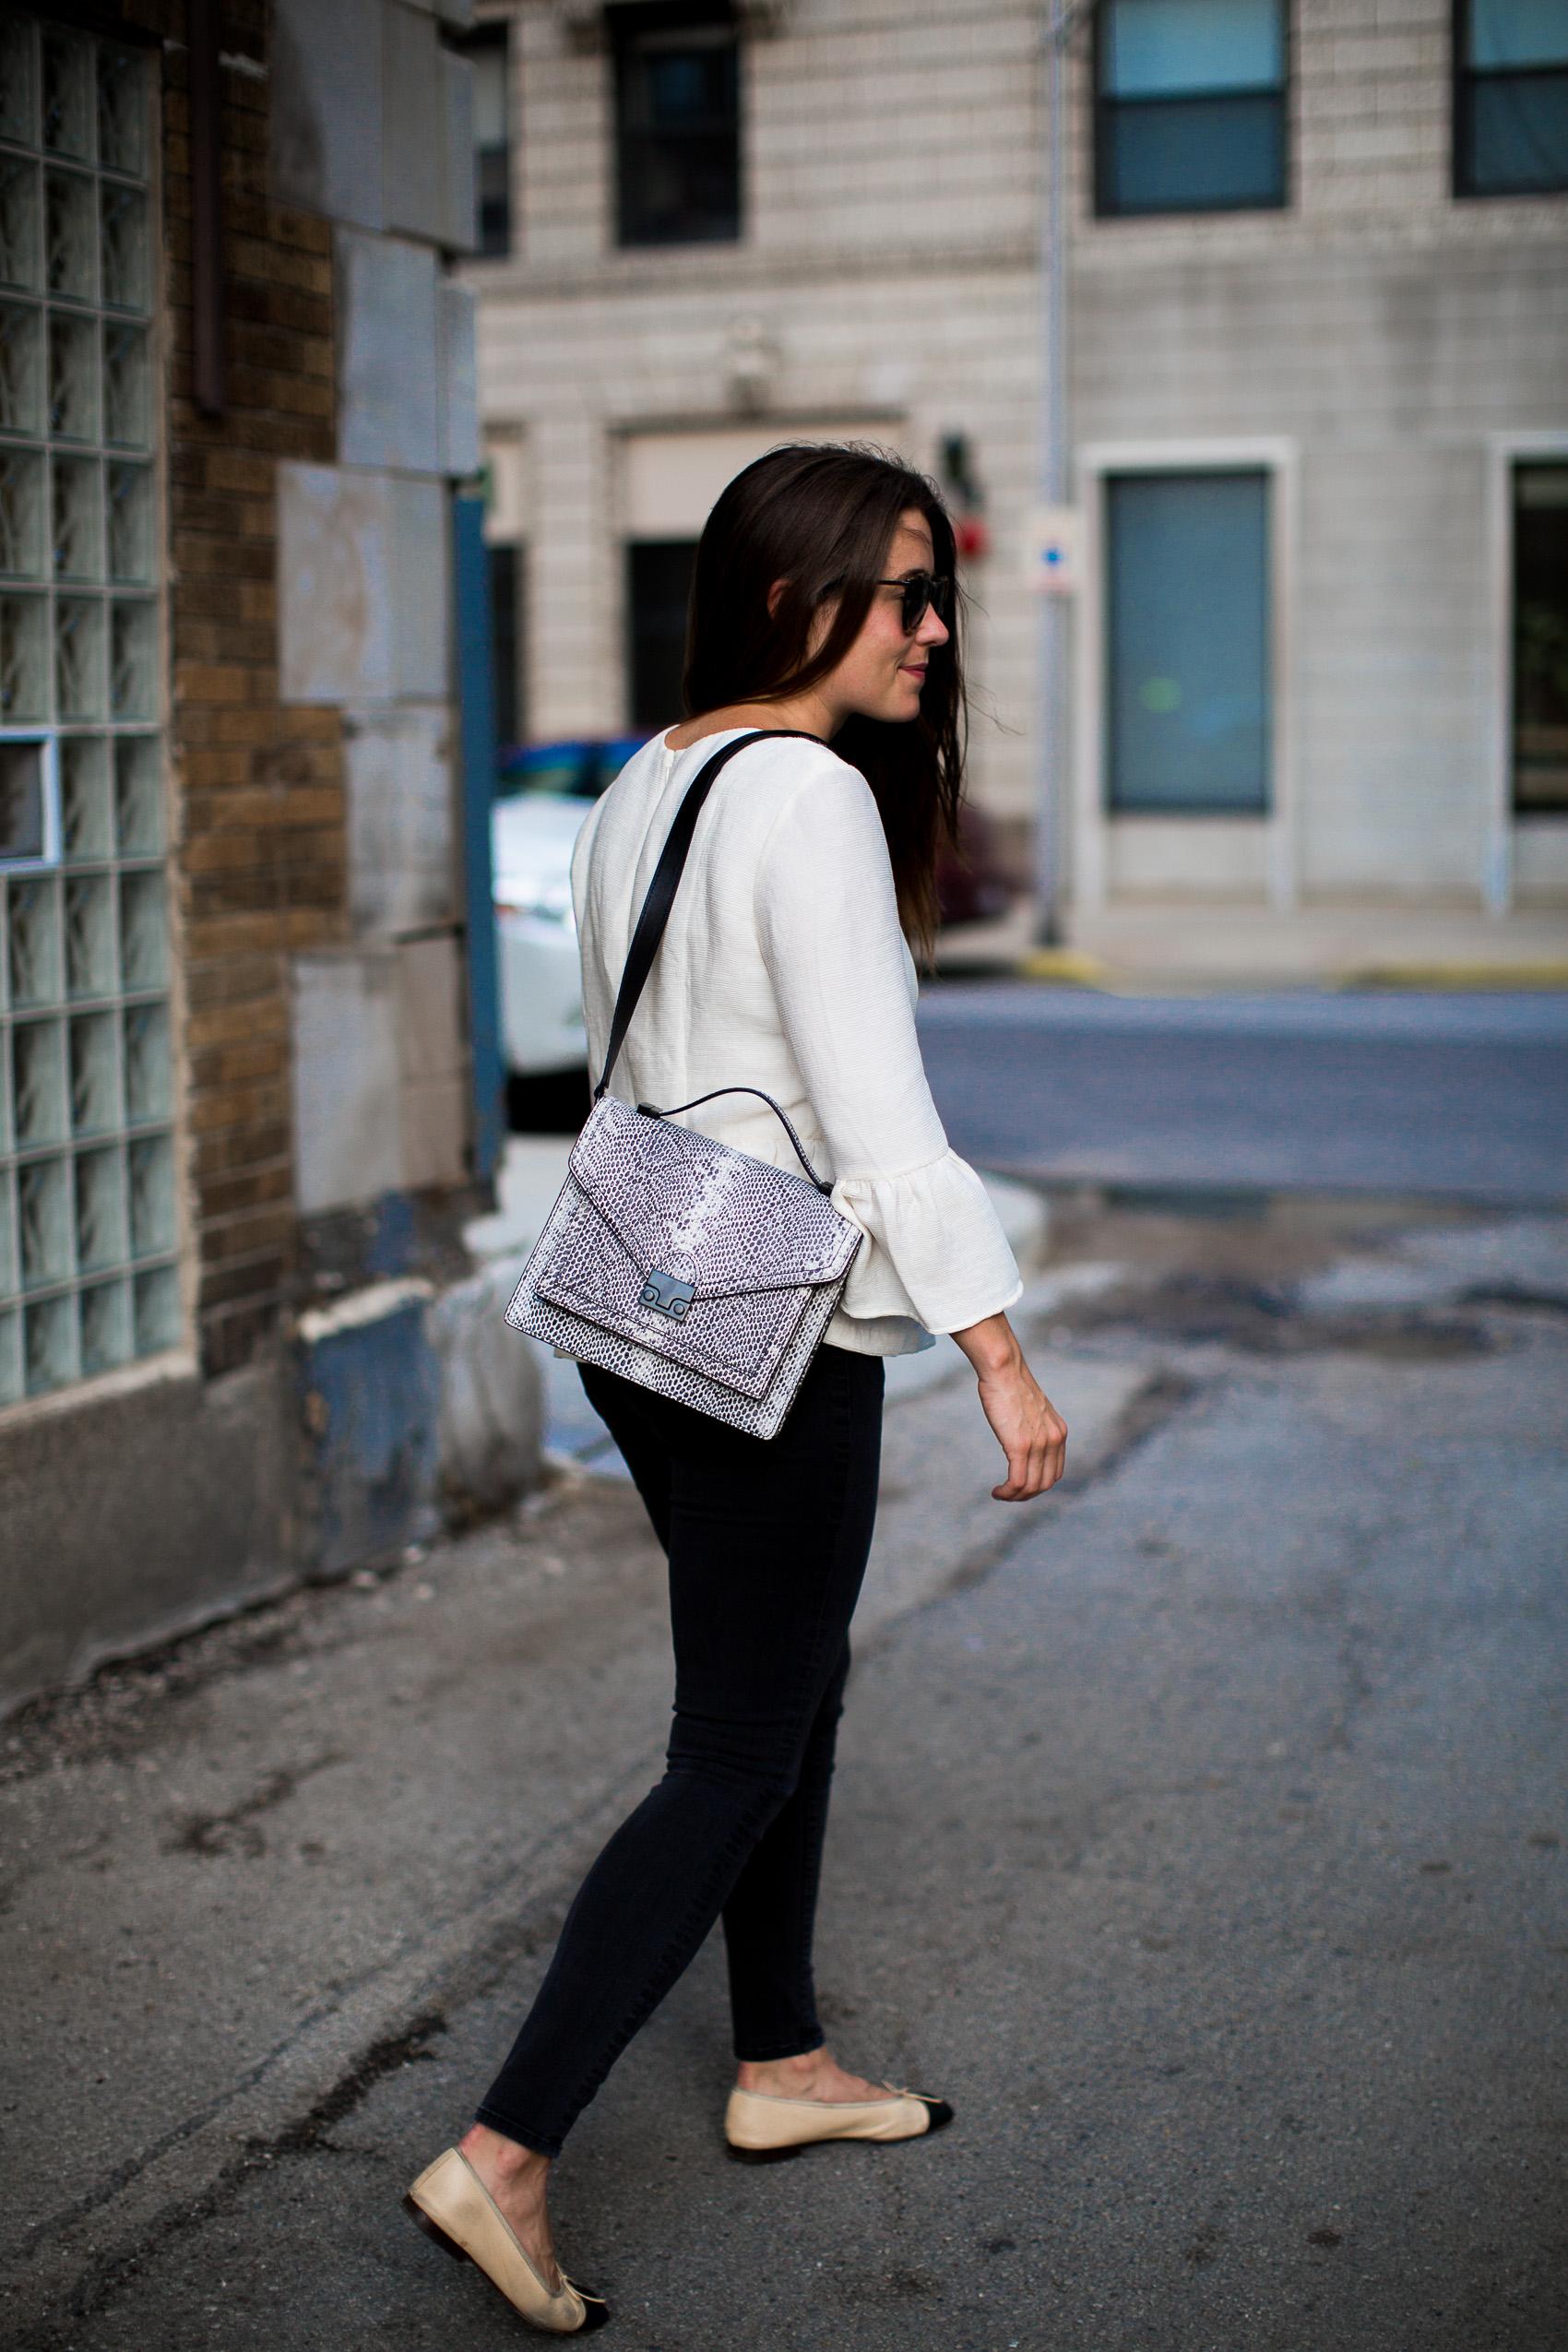 My Favorite Handbags - Sequins & Stripes